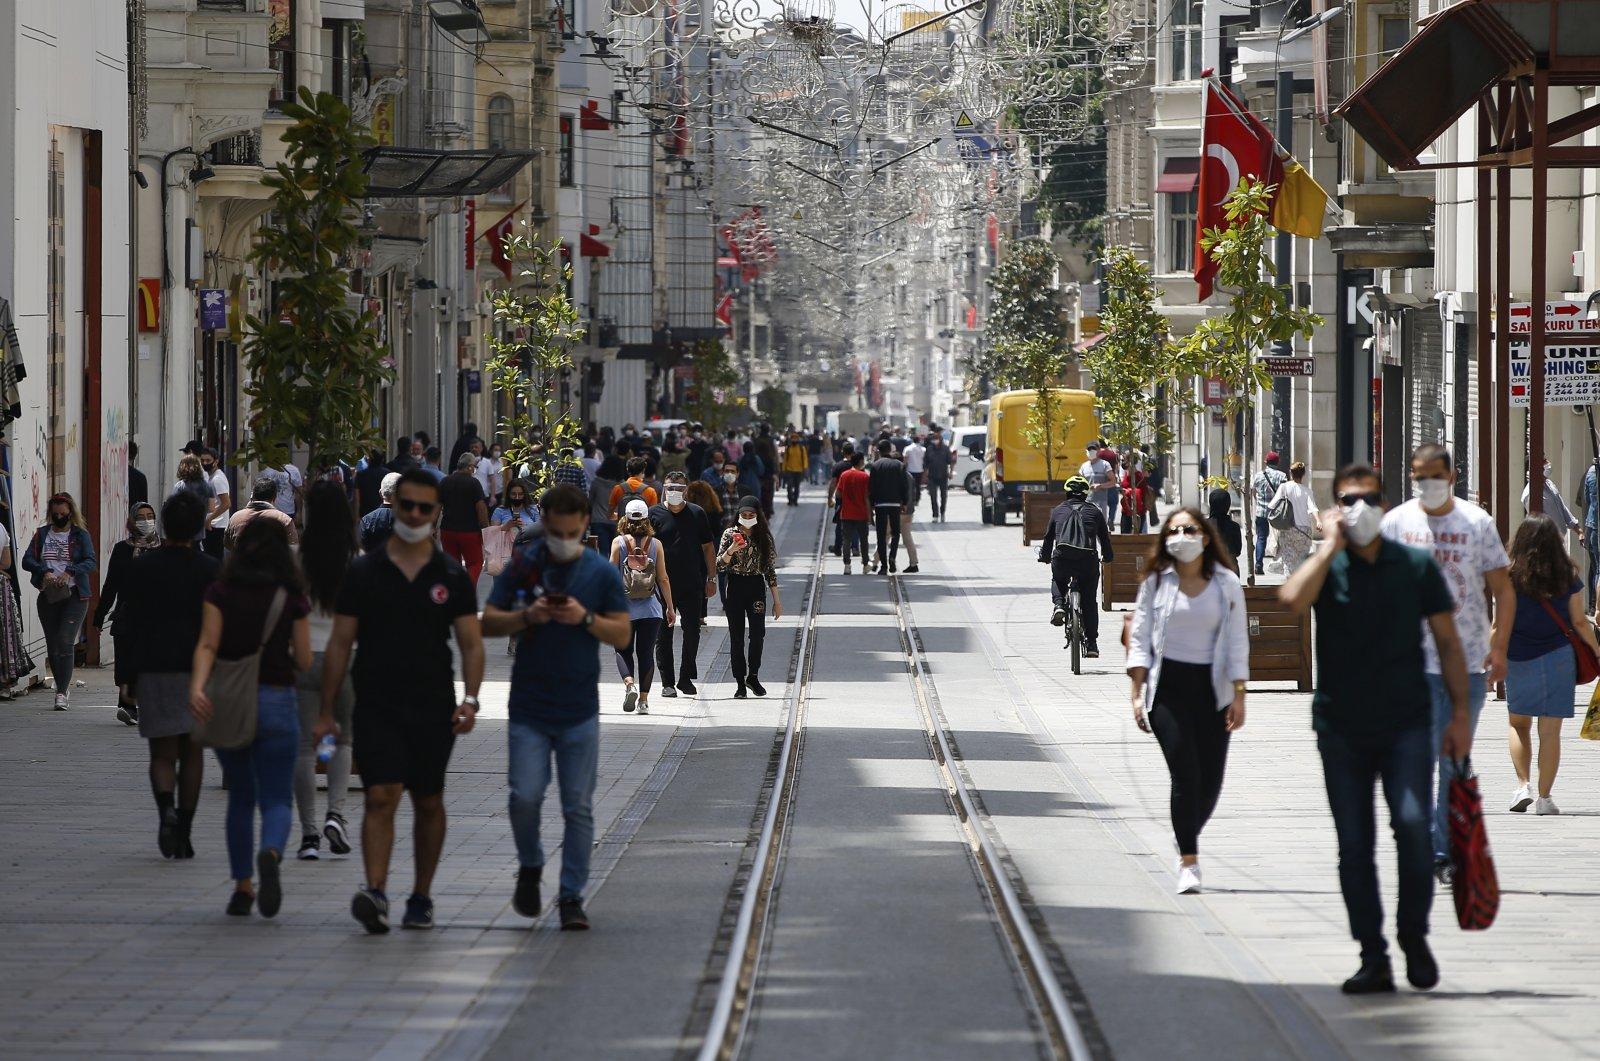 People walk along Istiklal Street near Taksim Square, Istanbul, Turkey, May 15, 2020. (AP Photo)